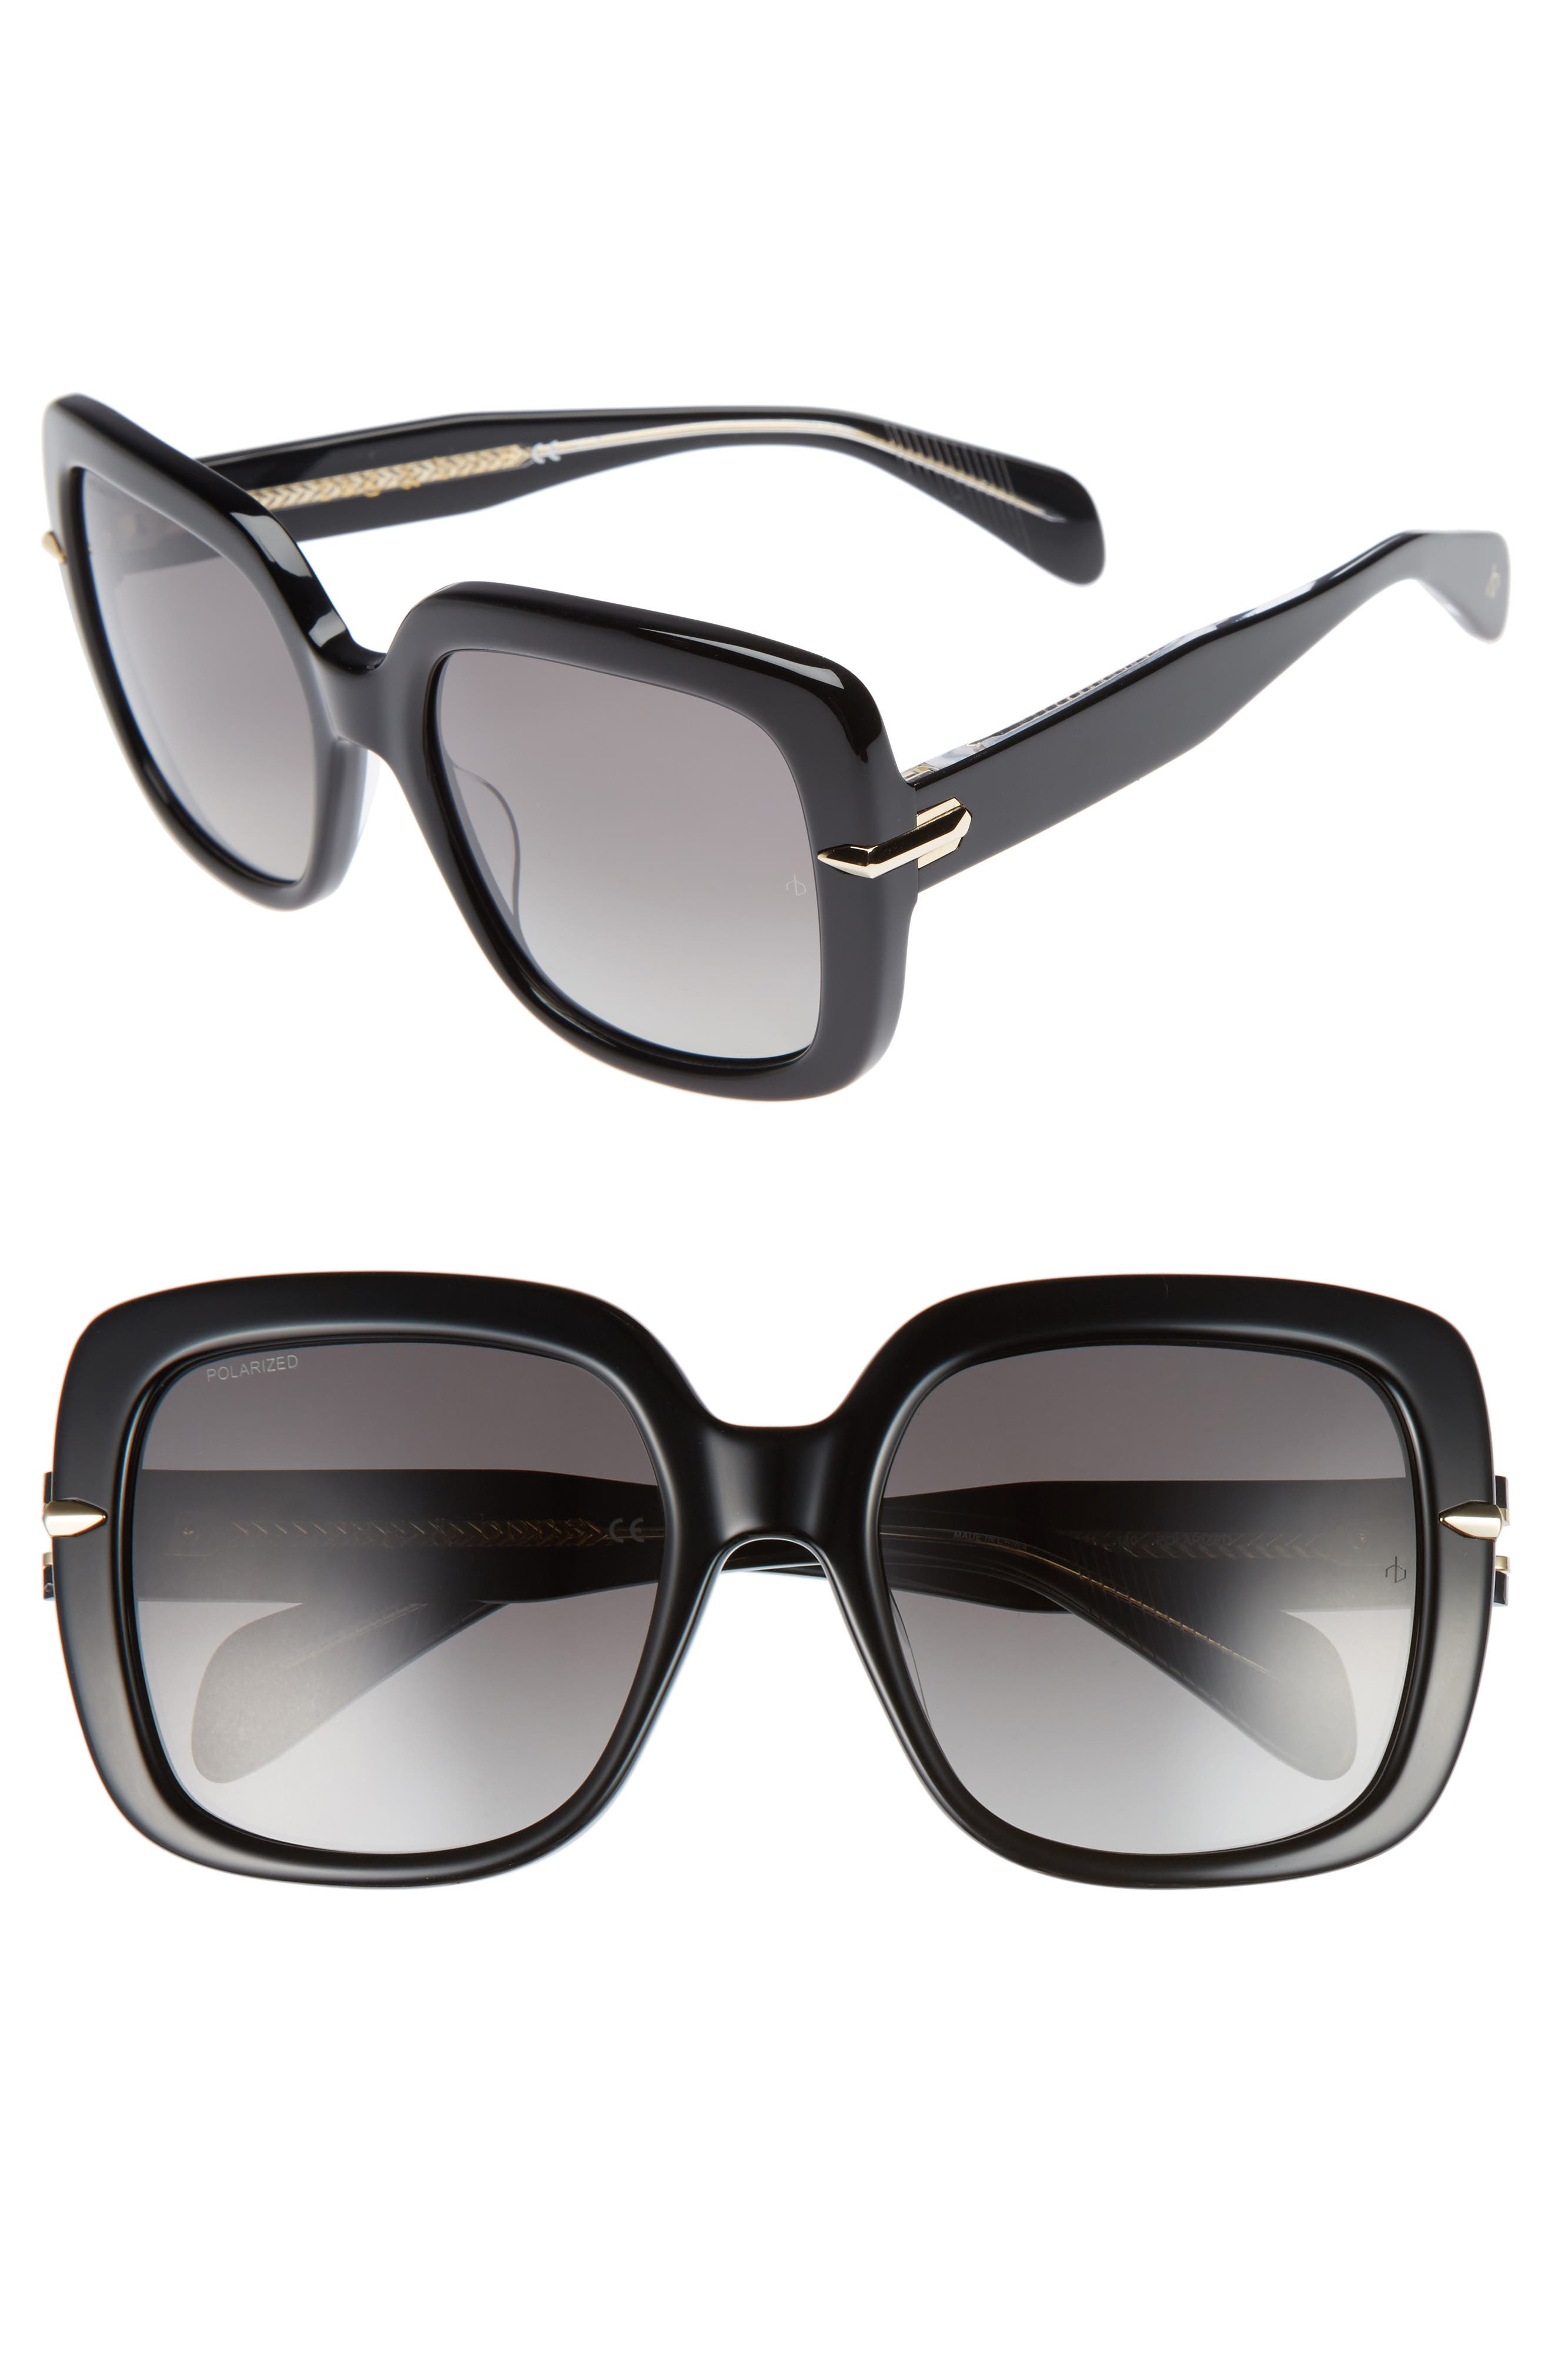 rag & bone 56mm Square Polarized Sunglasses